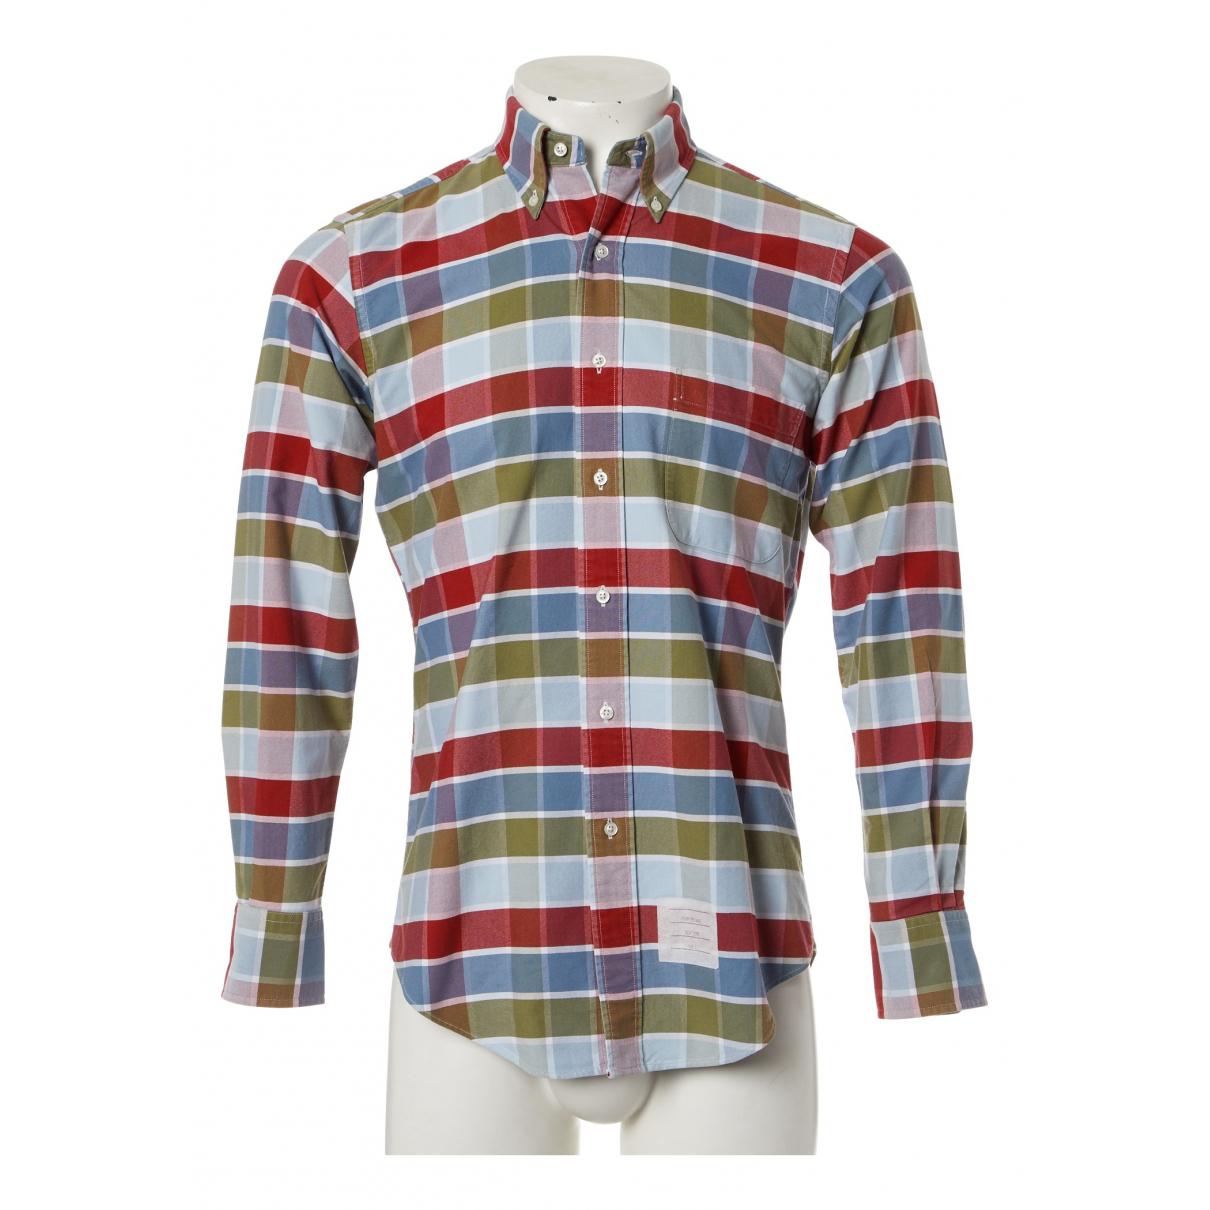 Thom Browne N Multicolour Cotton Shirts for Men S International